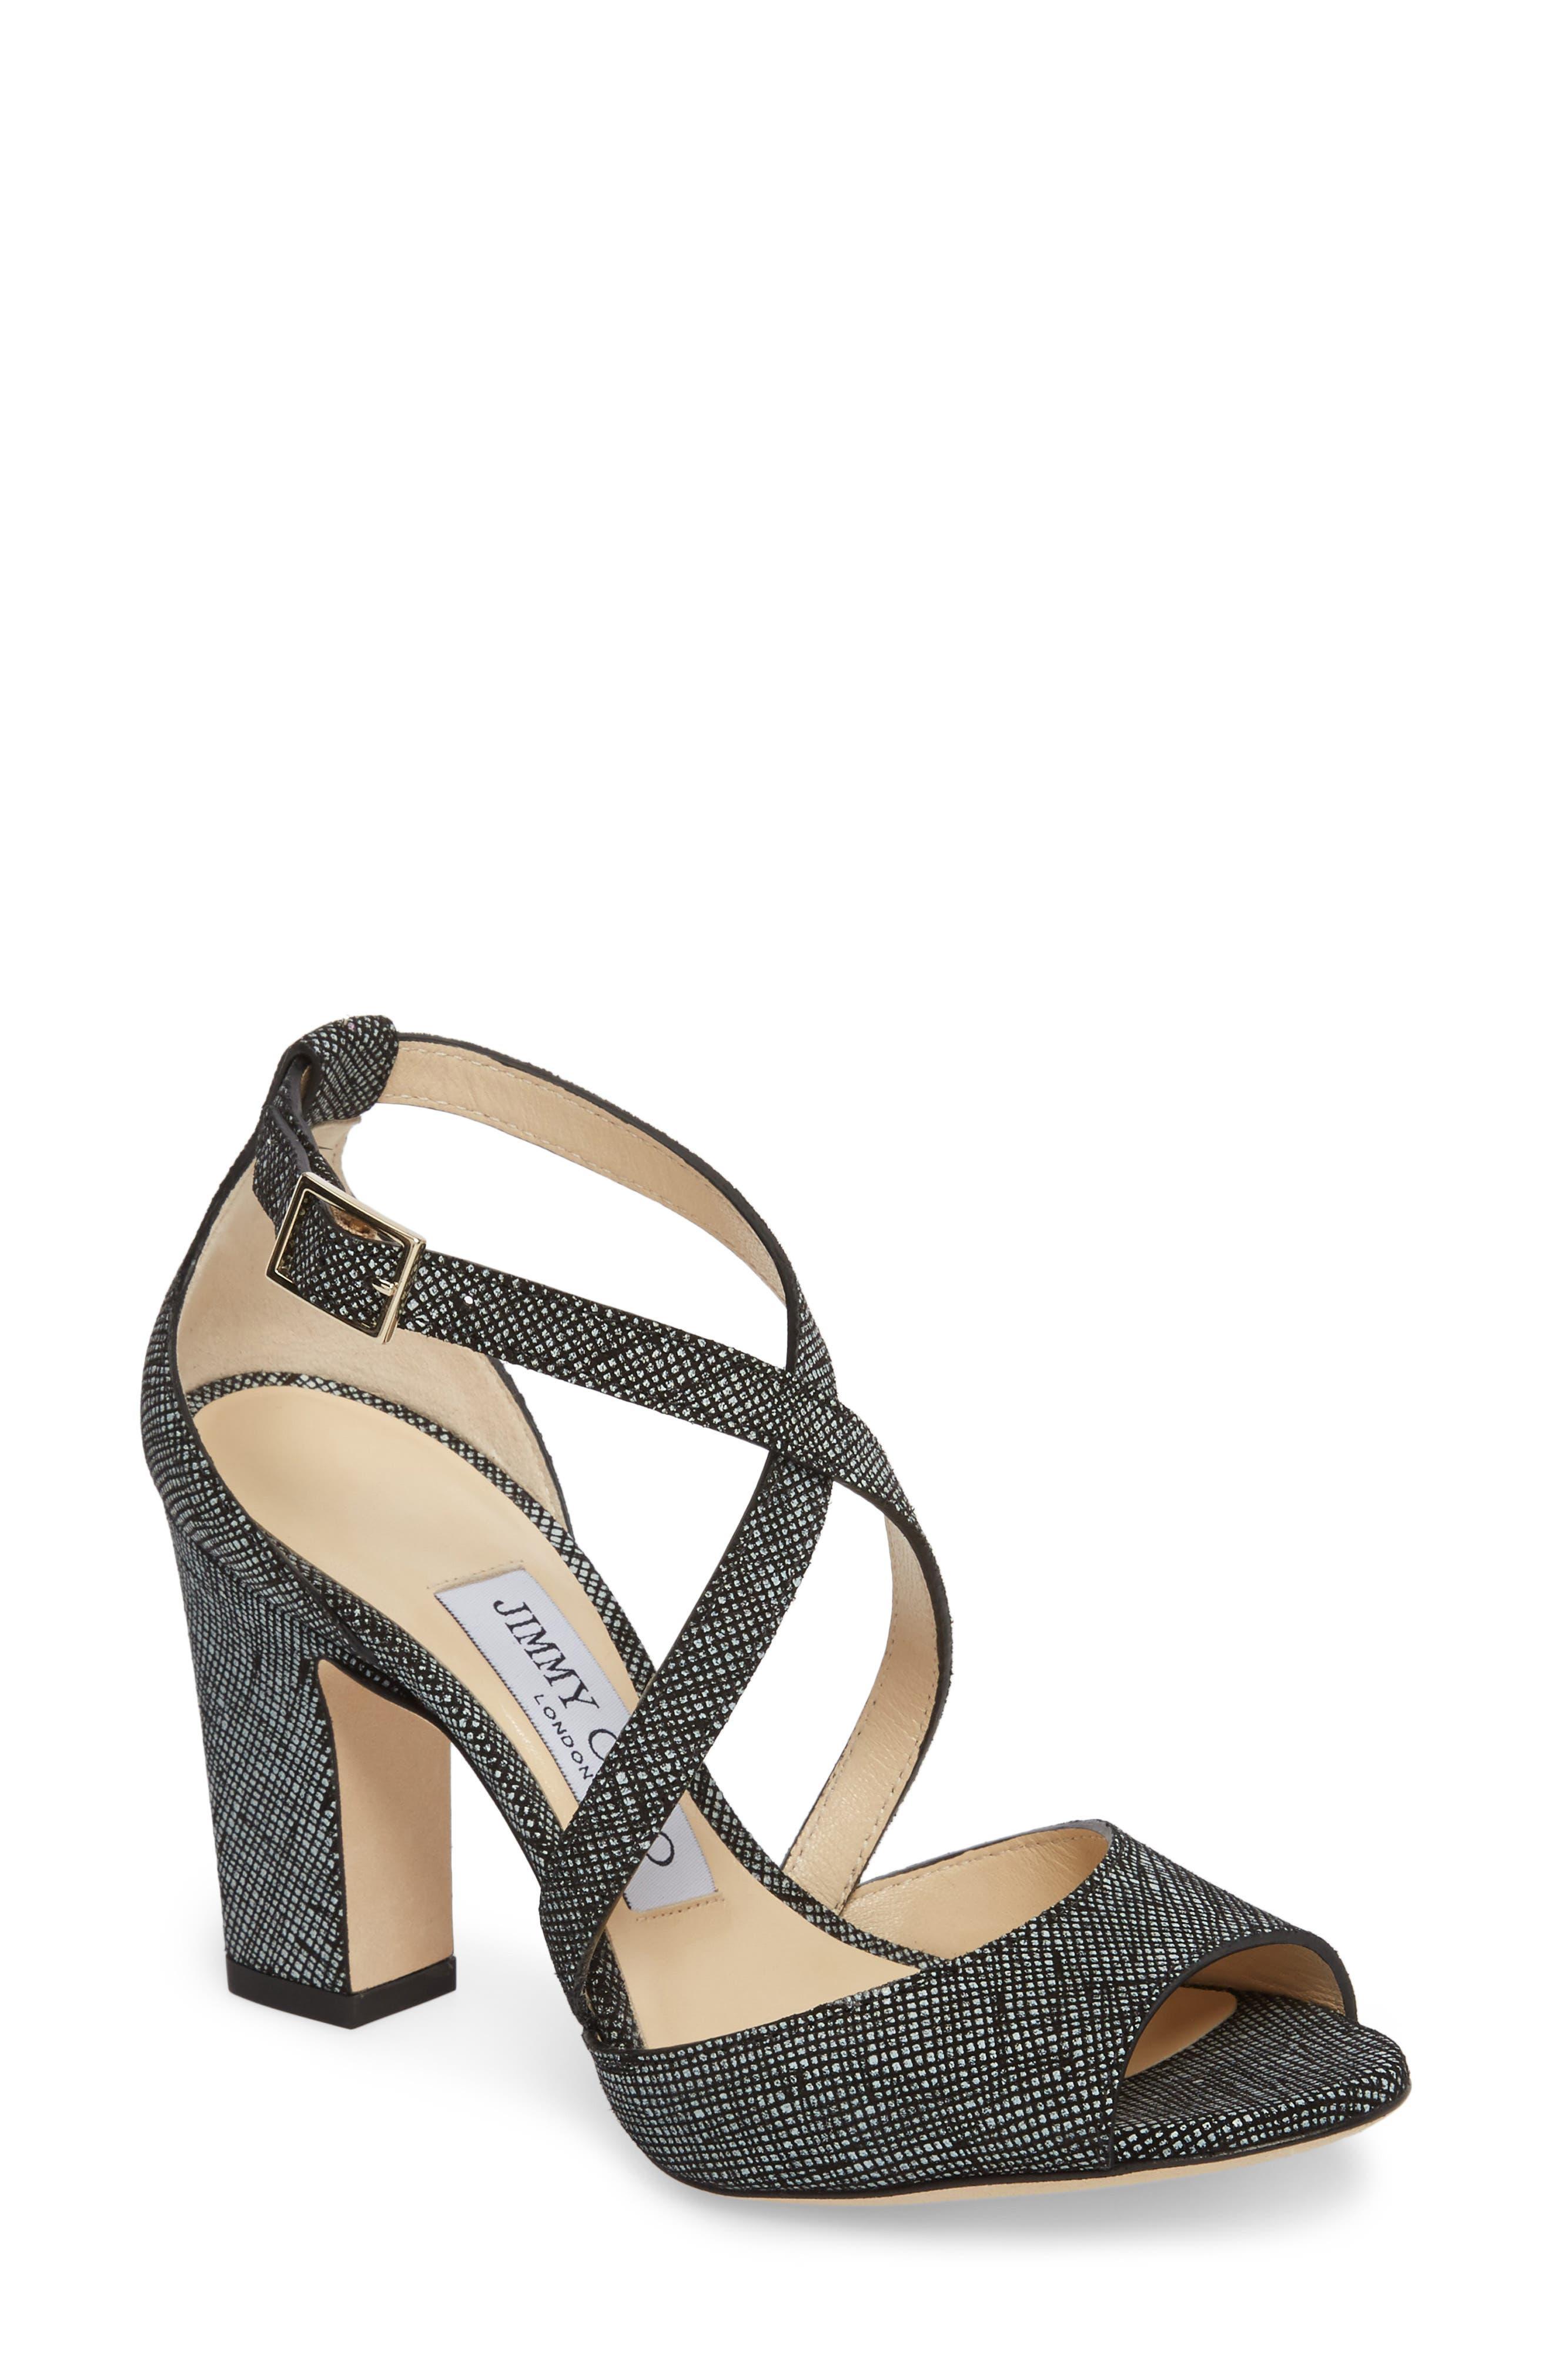 Alternate Image 1 Selected - Jimmy Choo Carrie Cross Strap Sandal (Women)